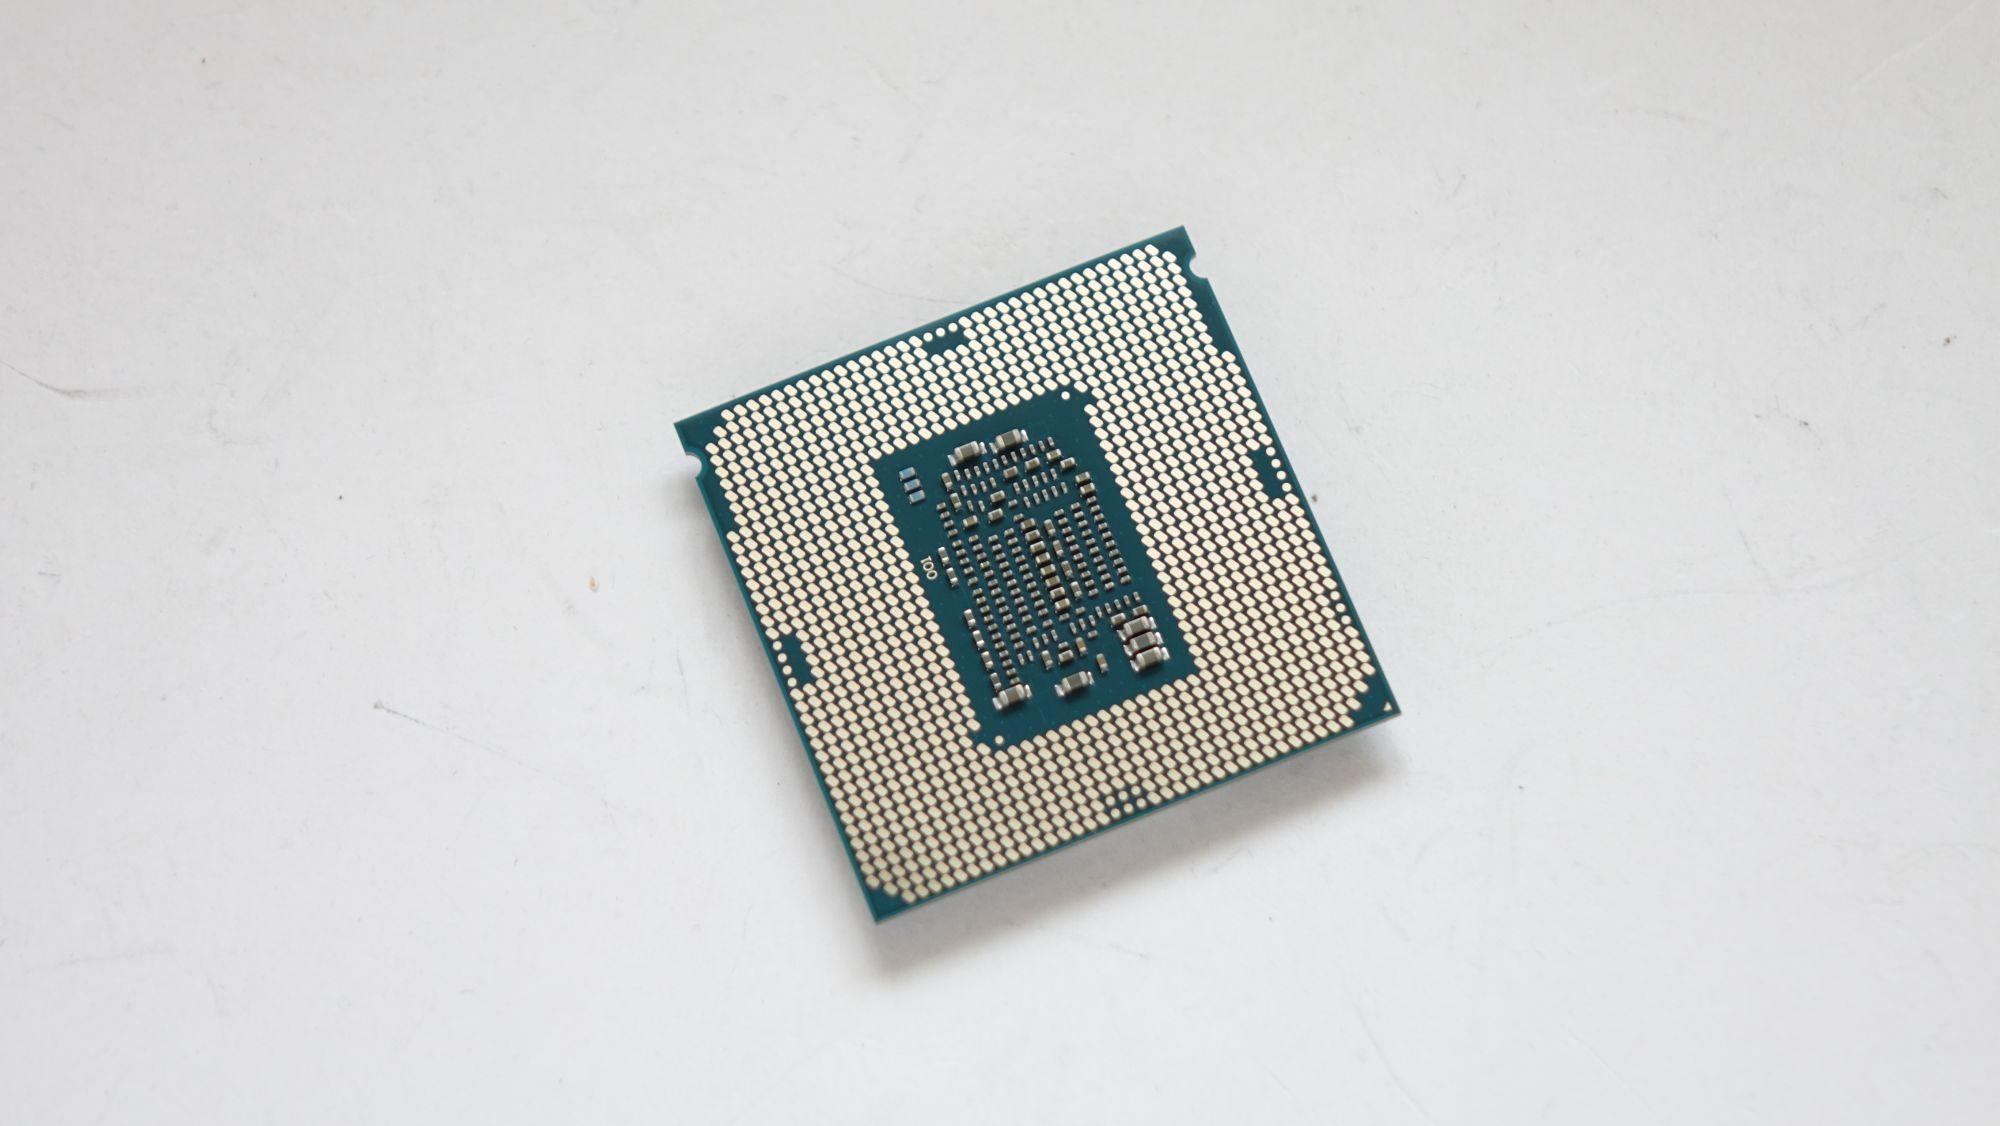 Intel Core i7-7700K контакты